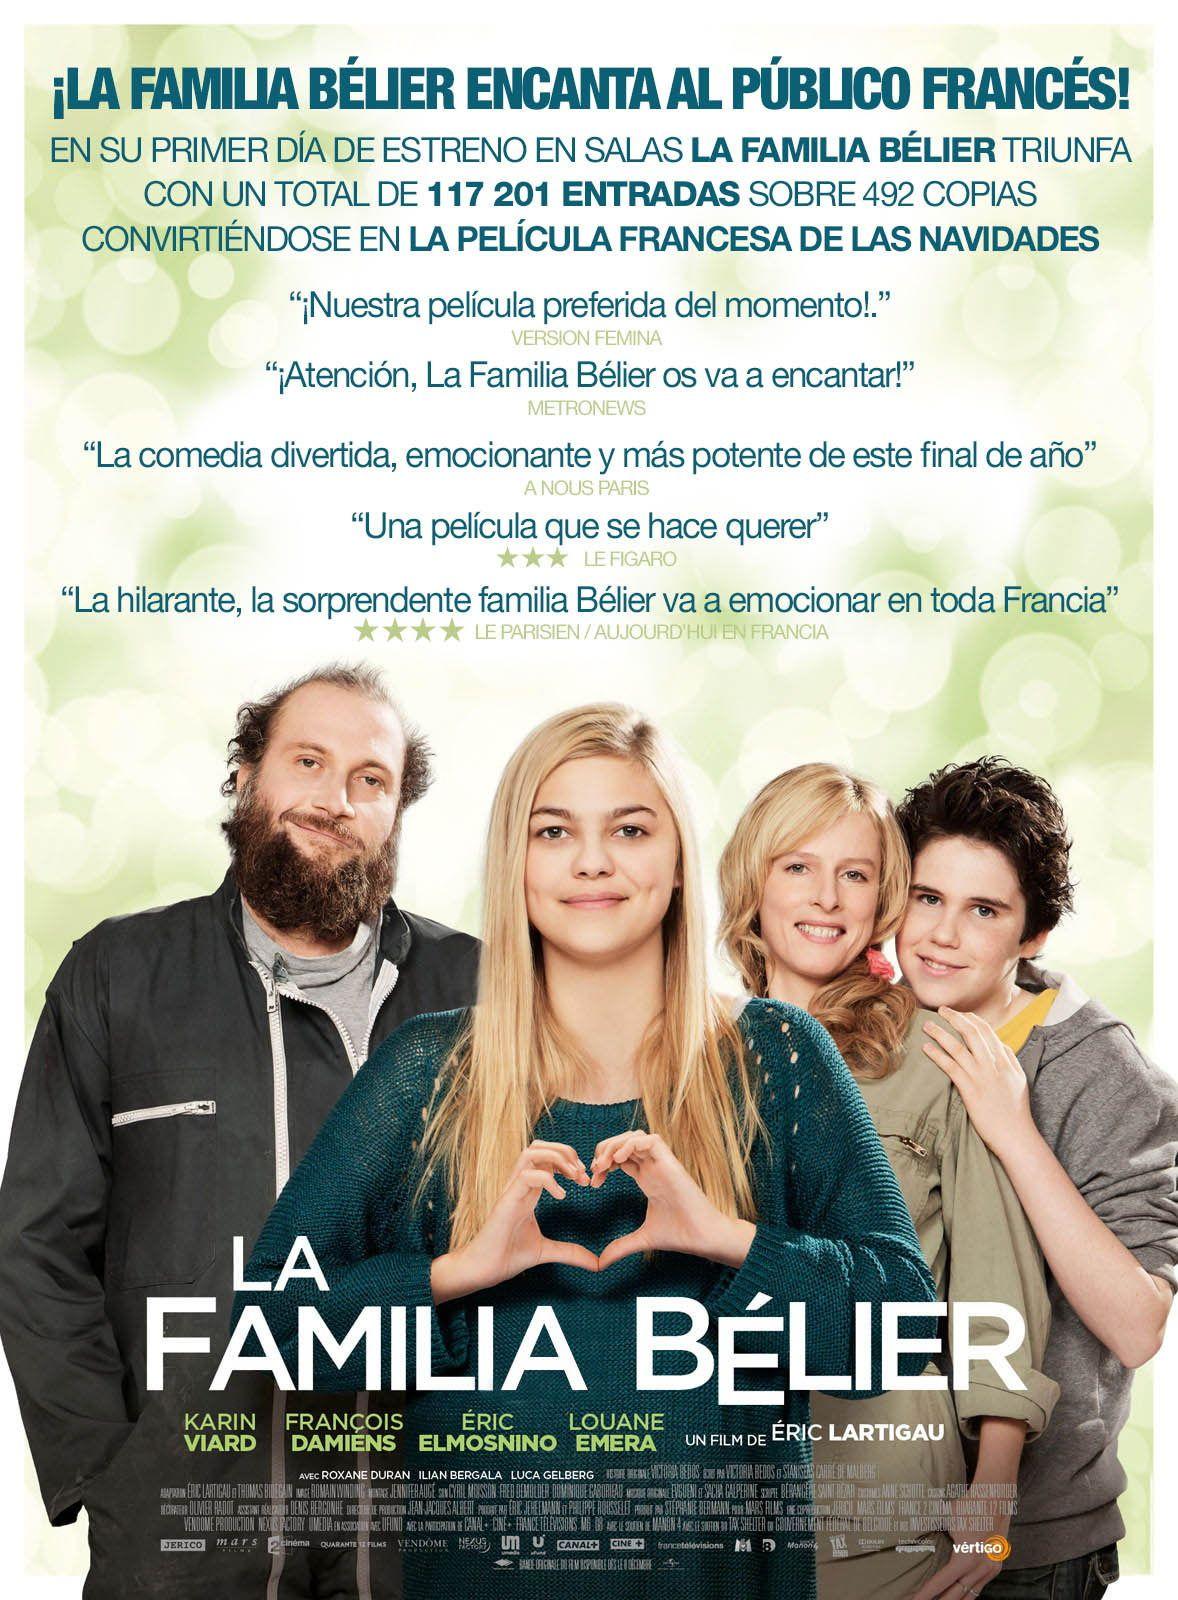 La Familia Belier Peliculas Carteleras De Cine Cine